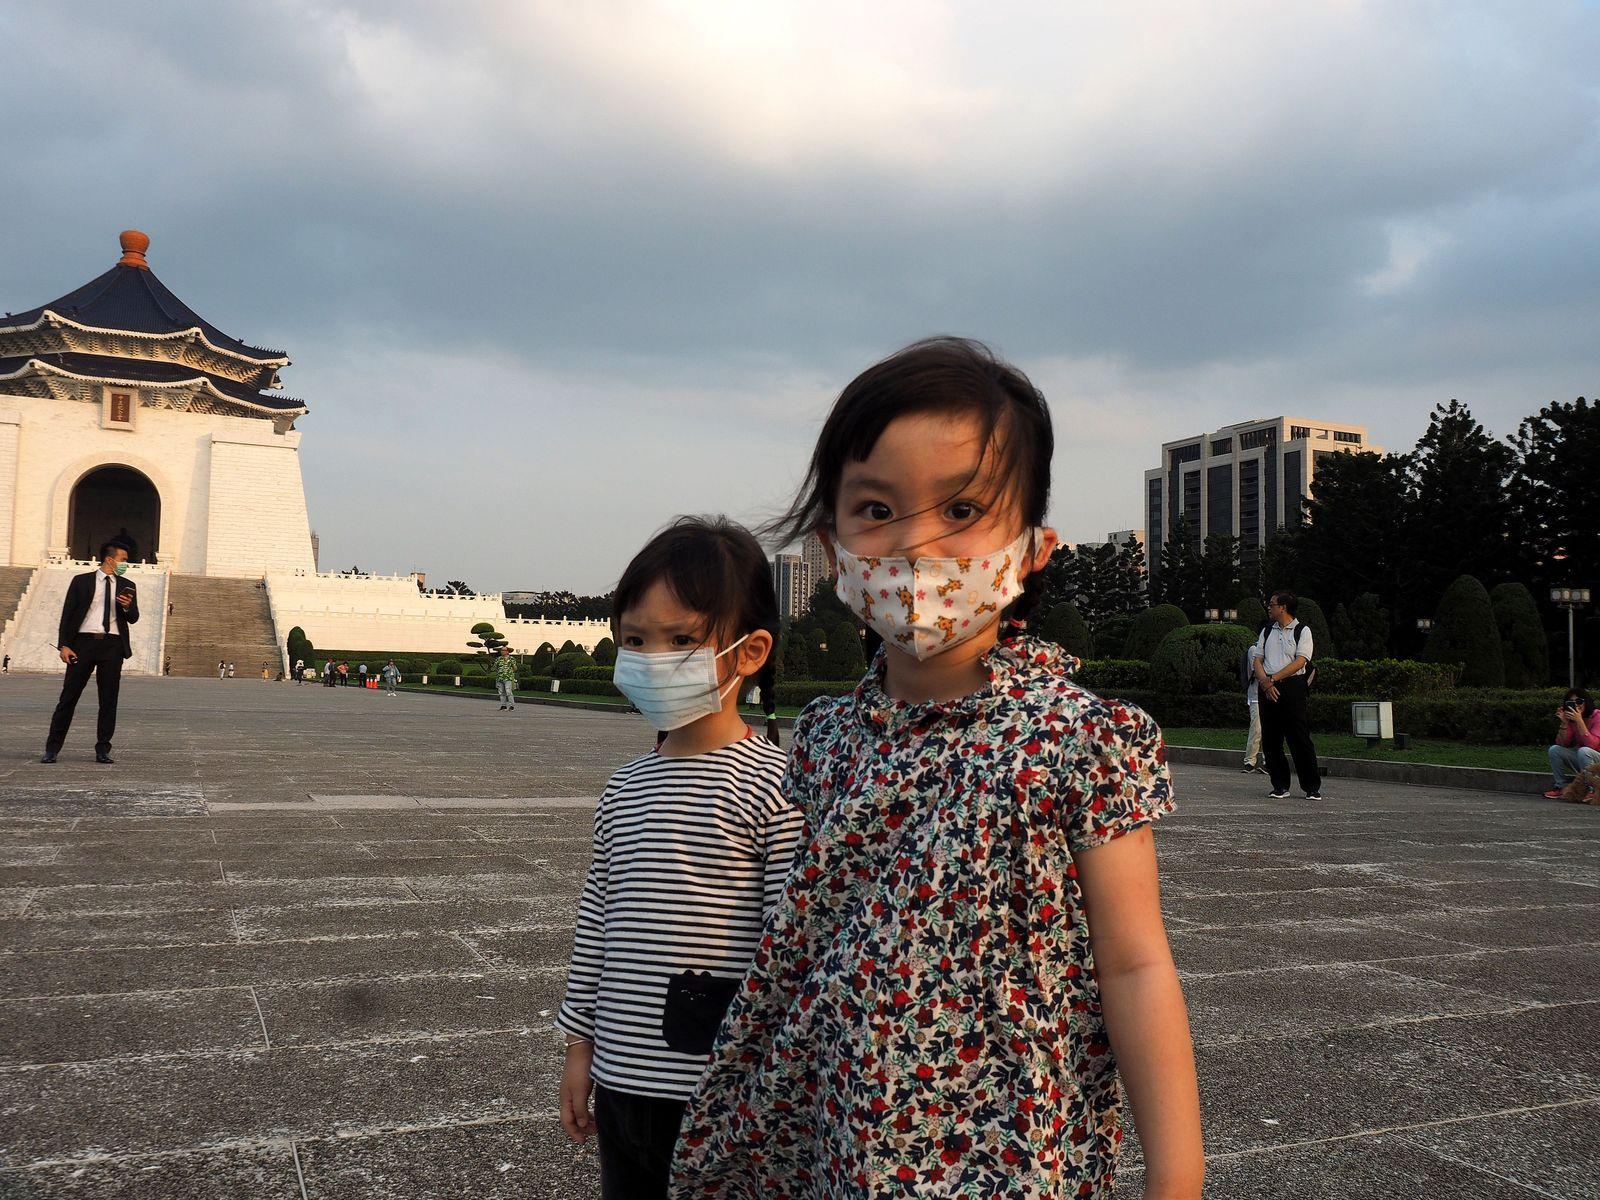 Coronavirus in Taiwan, Taipei - 26 Mar 2020